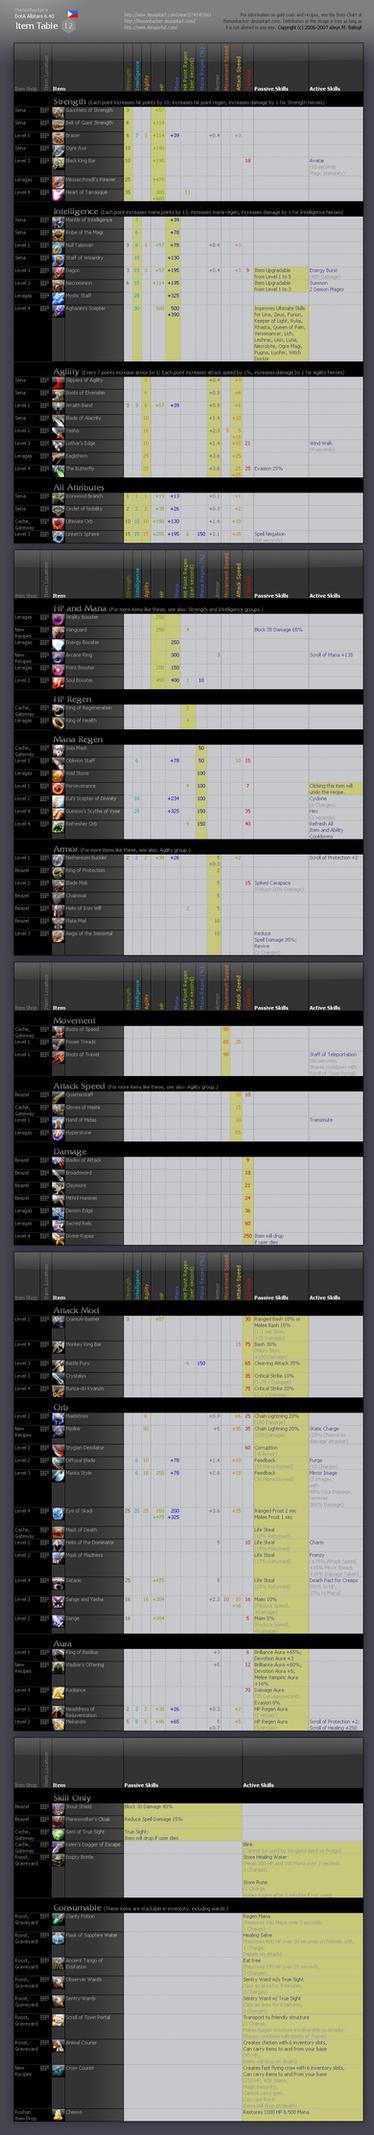 DotA Allstars 6.40 Item Table by thenonhacker